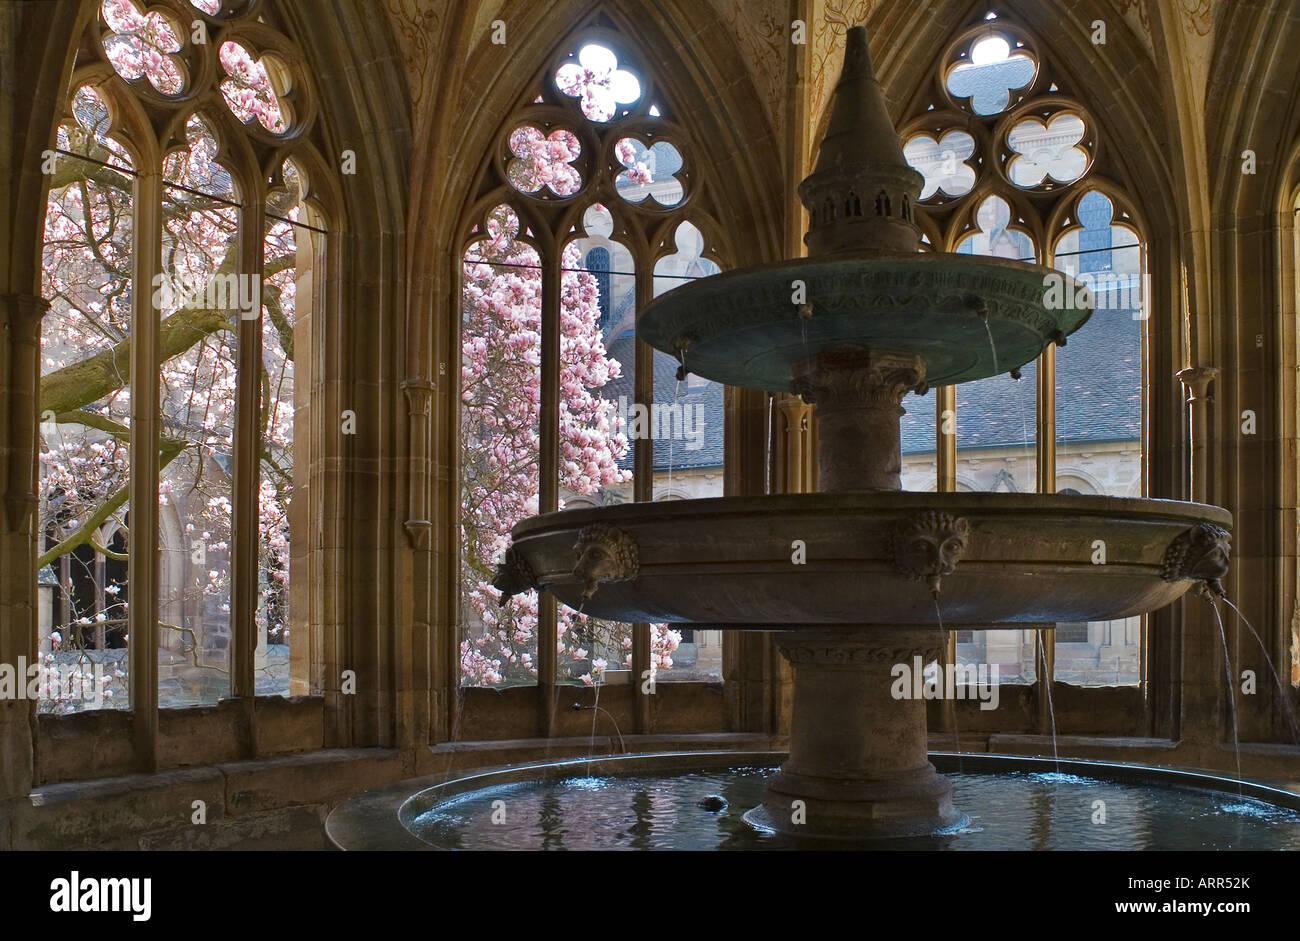 Fountain in the cistercian abbey of Maulbronn Stock Photo